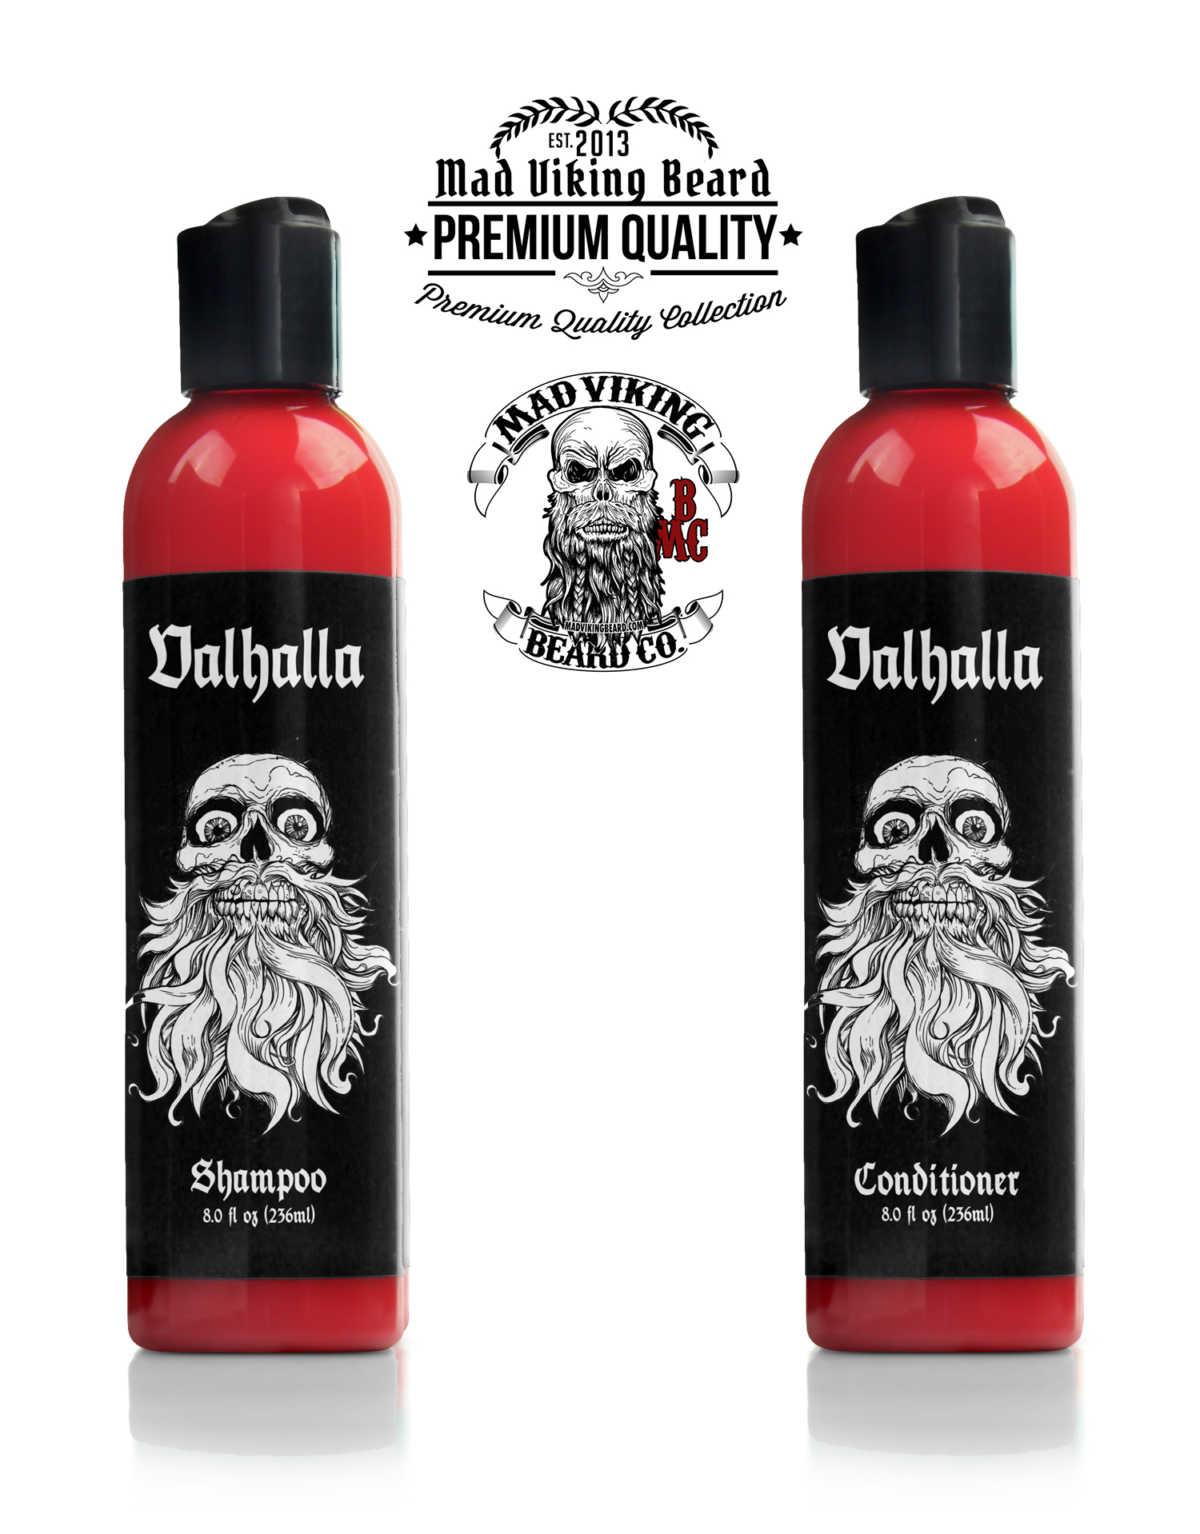 Mad Viking Valhalla Shampoo & Conditioner